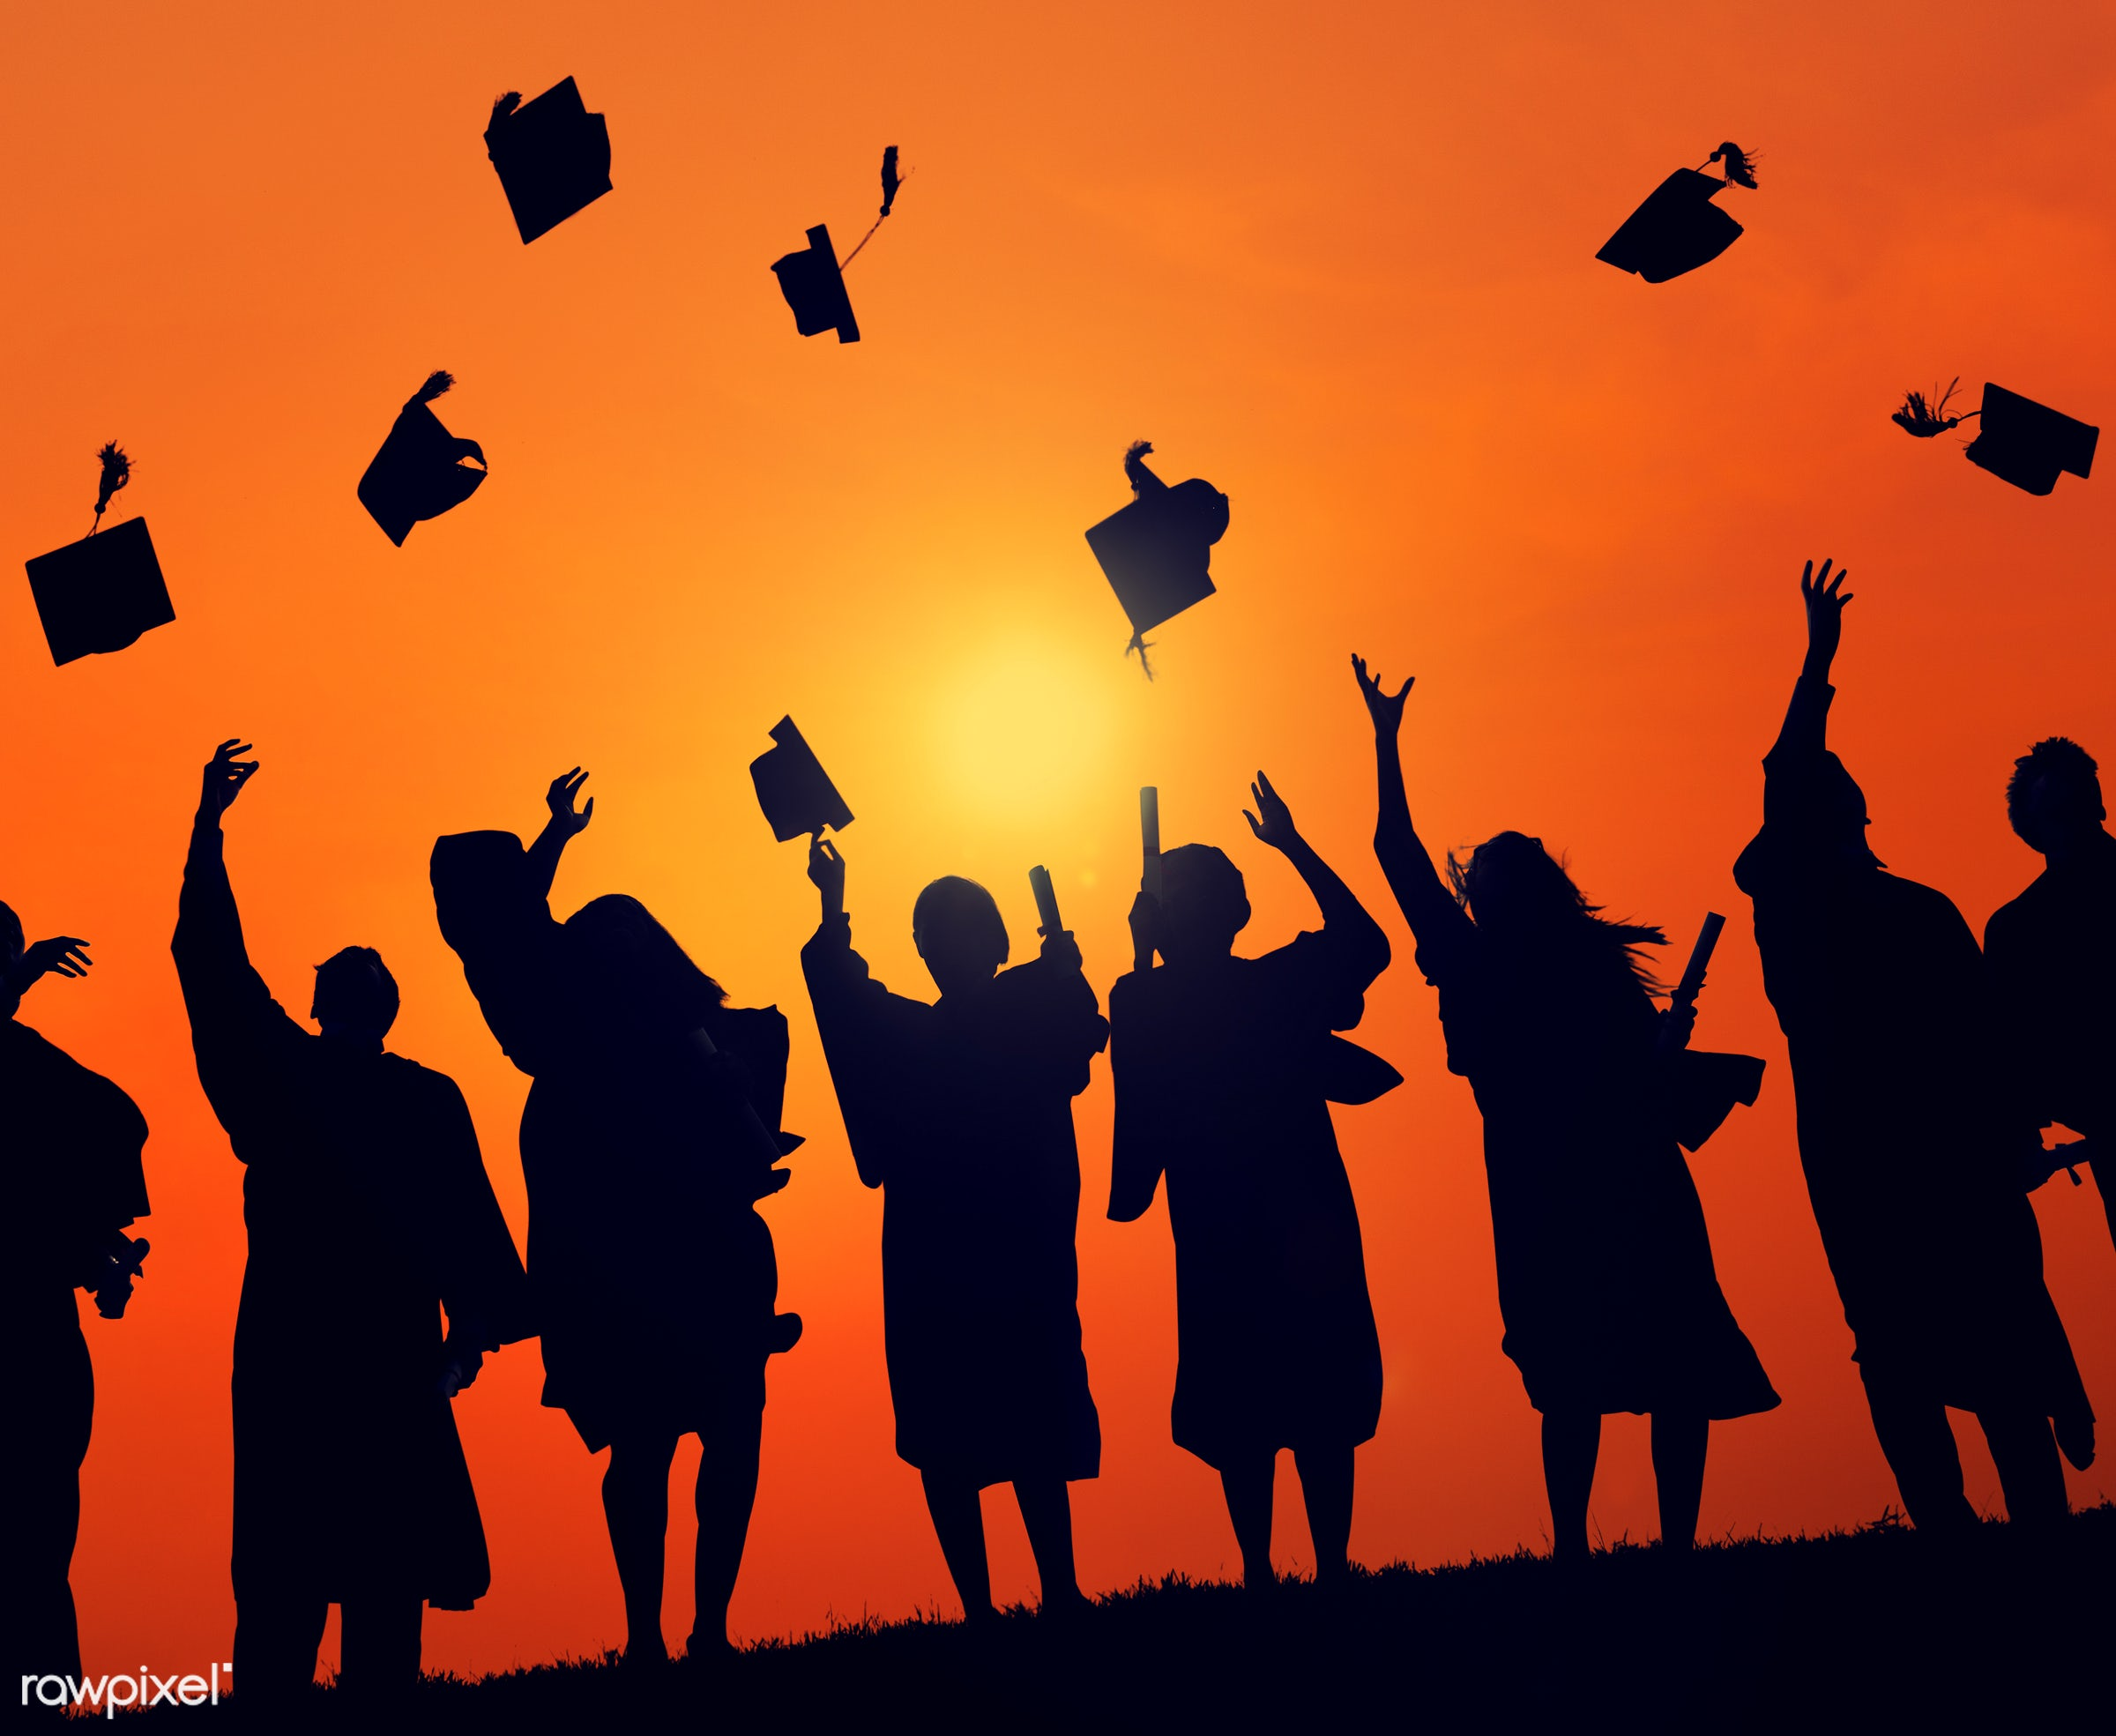 dusk, academic, achievement, backlit, campus, cap, celebration, ceremony, cheerful, college, dawn, degree, diploma,...